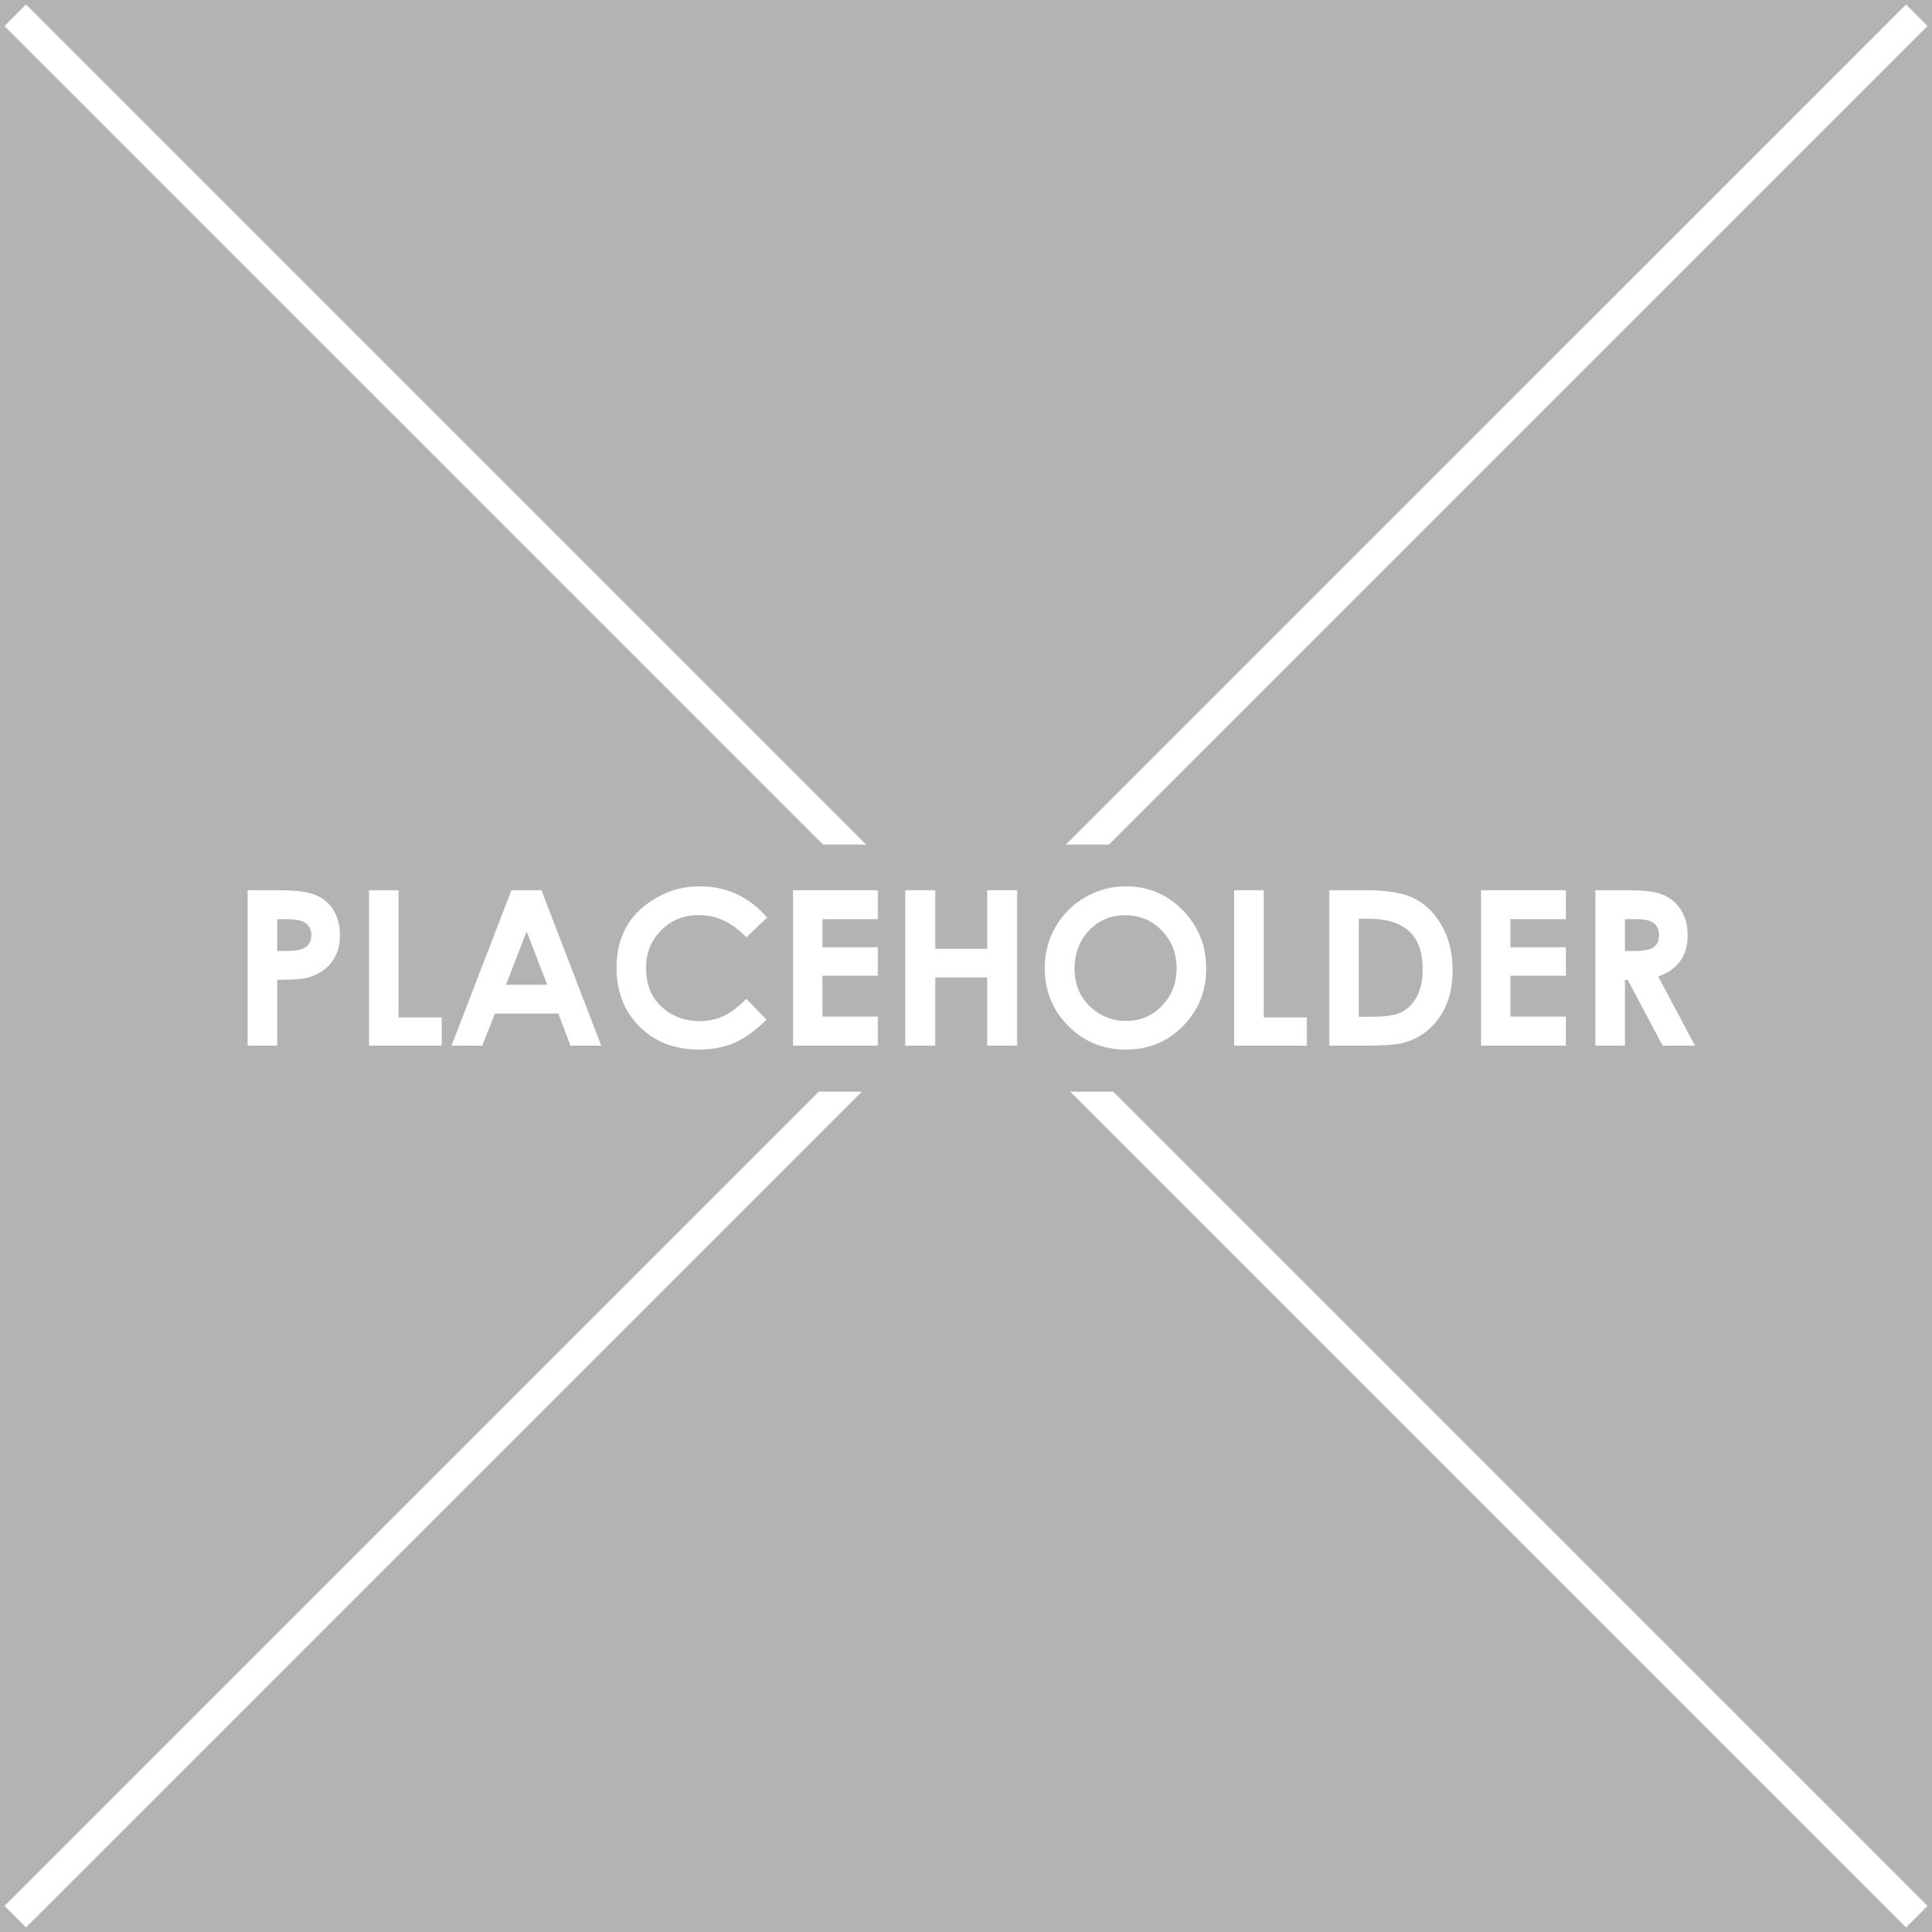 Placeholder copy 2.png